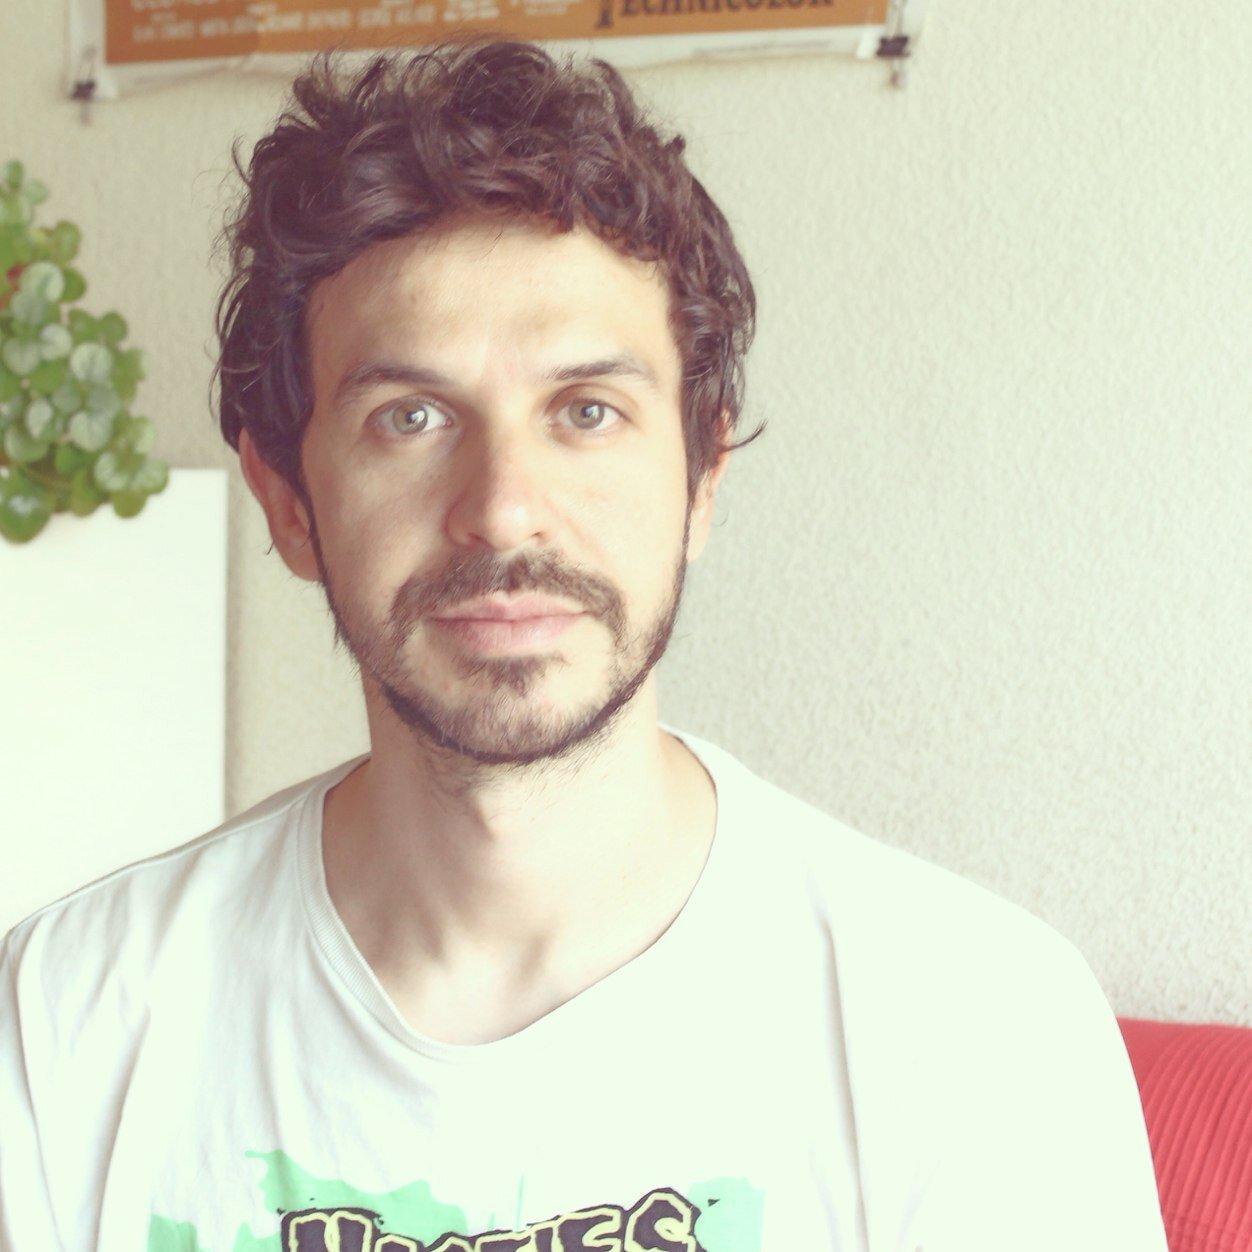 AndresRequejo